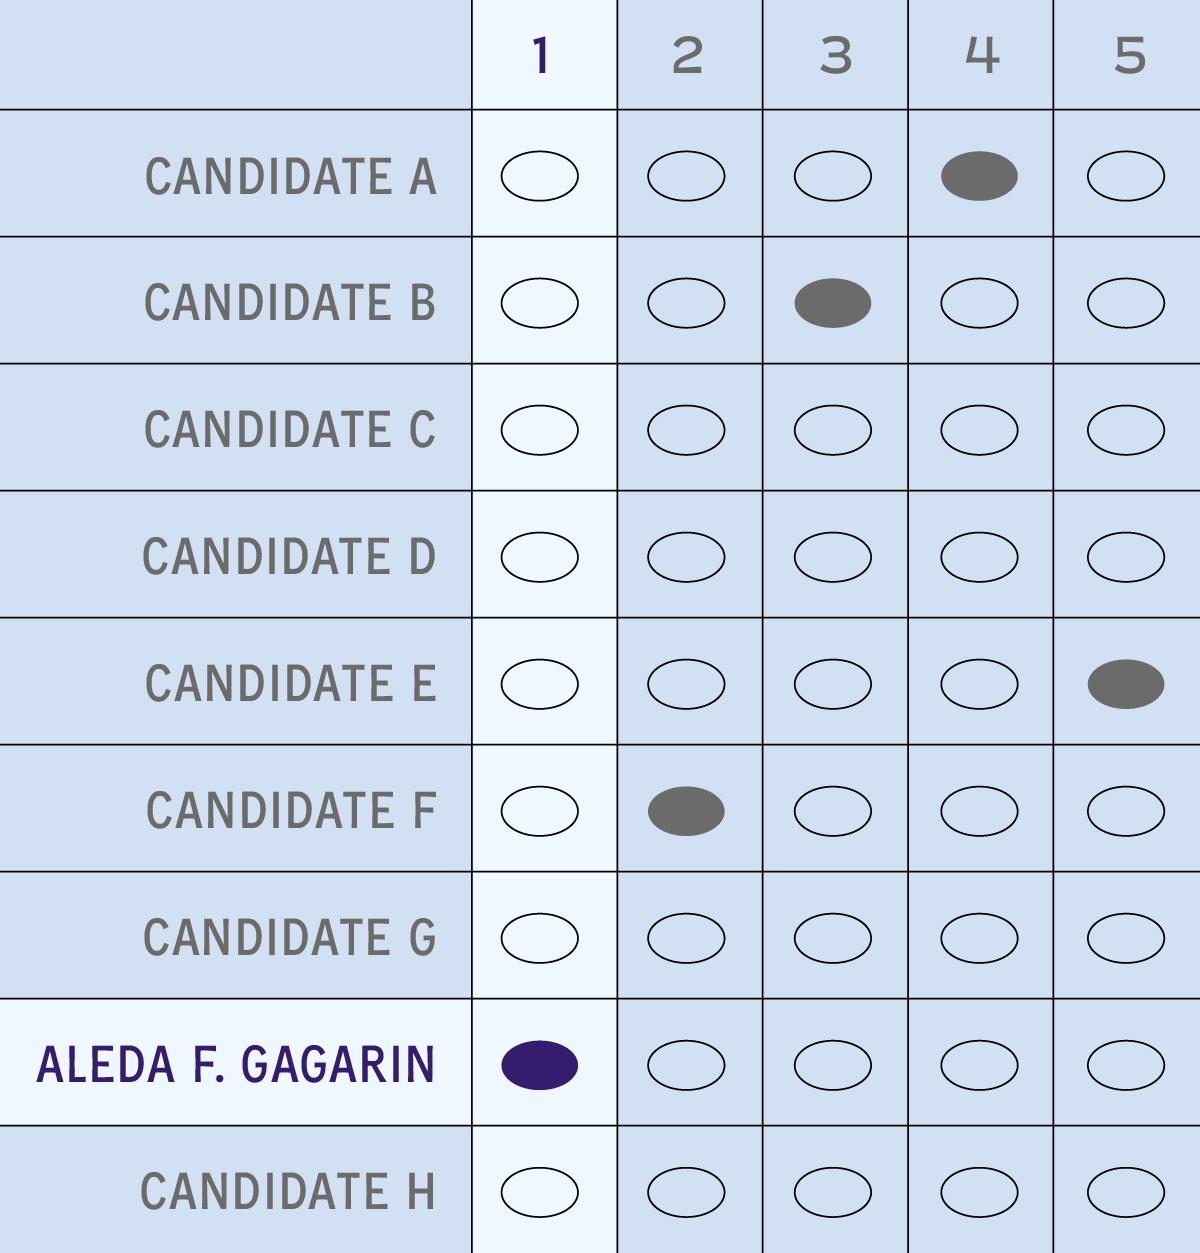 A correctly marked ballot